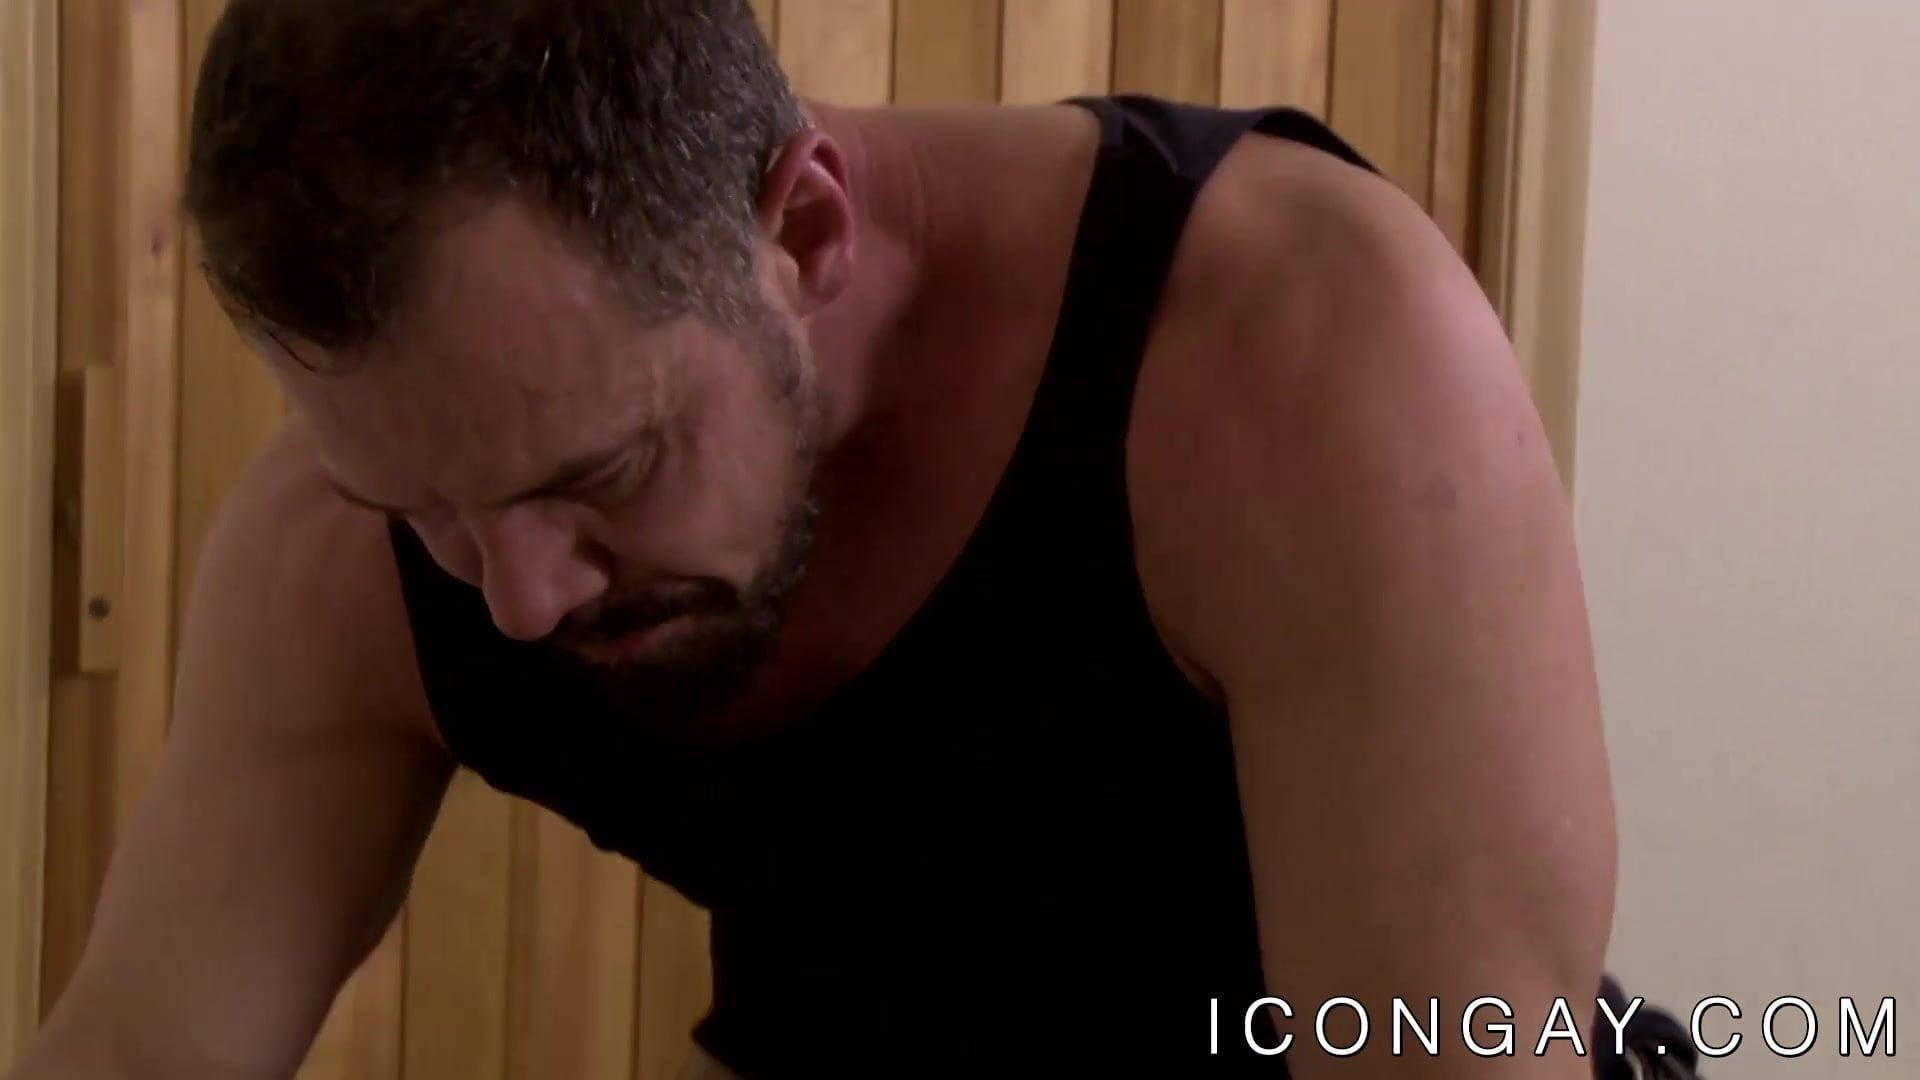 Mature homosexual Max Sargent passionately fucks hunk Tony Salerno